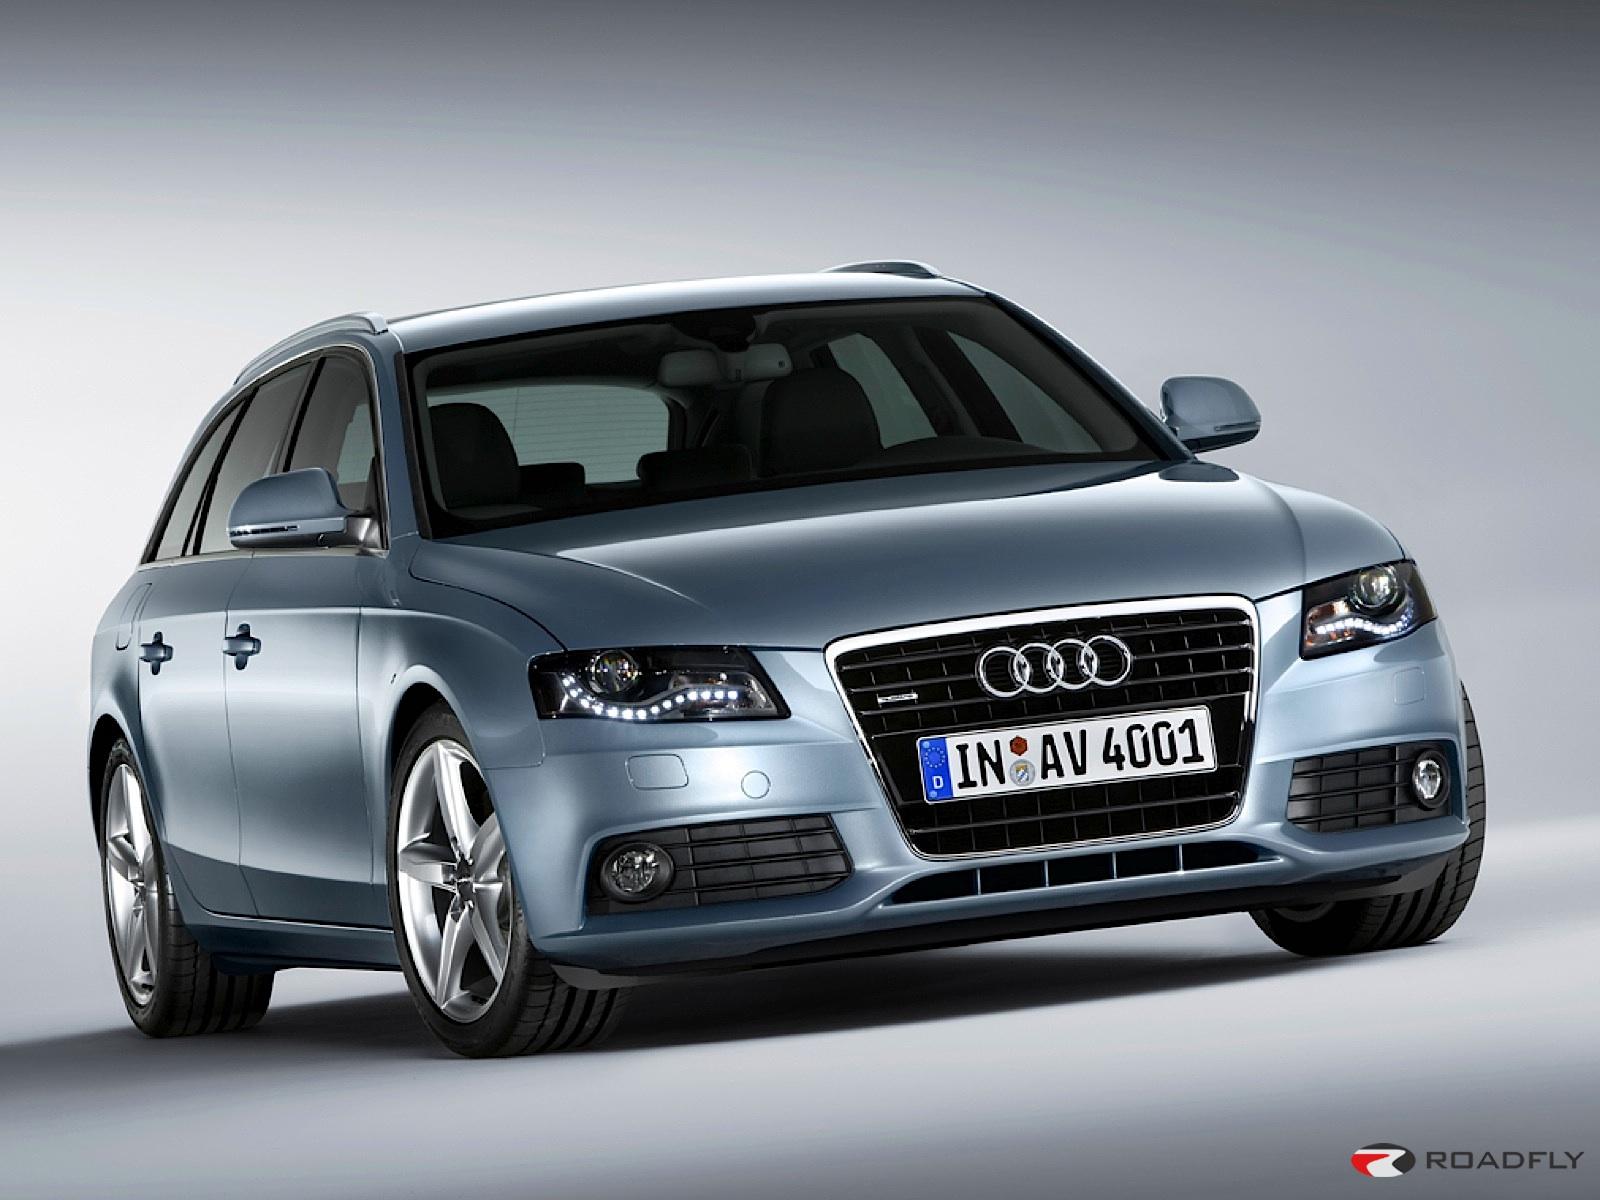 http://2.bp.blogspot.com/_T0wCg_POVxA/TLYTWlAoq7I/AAAAAAAAAGg/cRAiAnJT7ts/s1600/Audi+A4+1.jpg